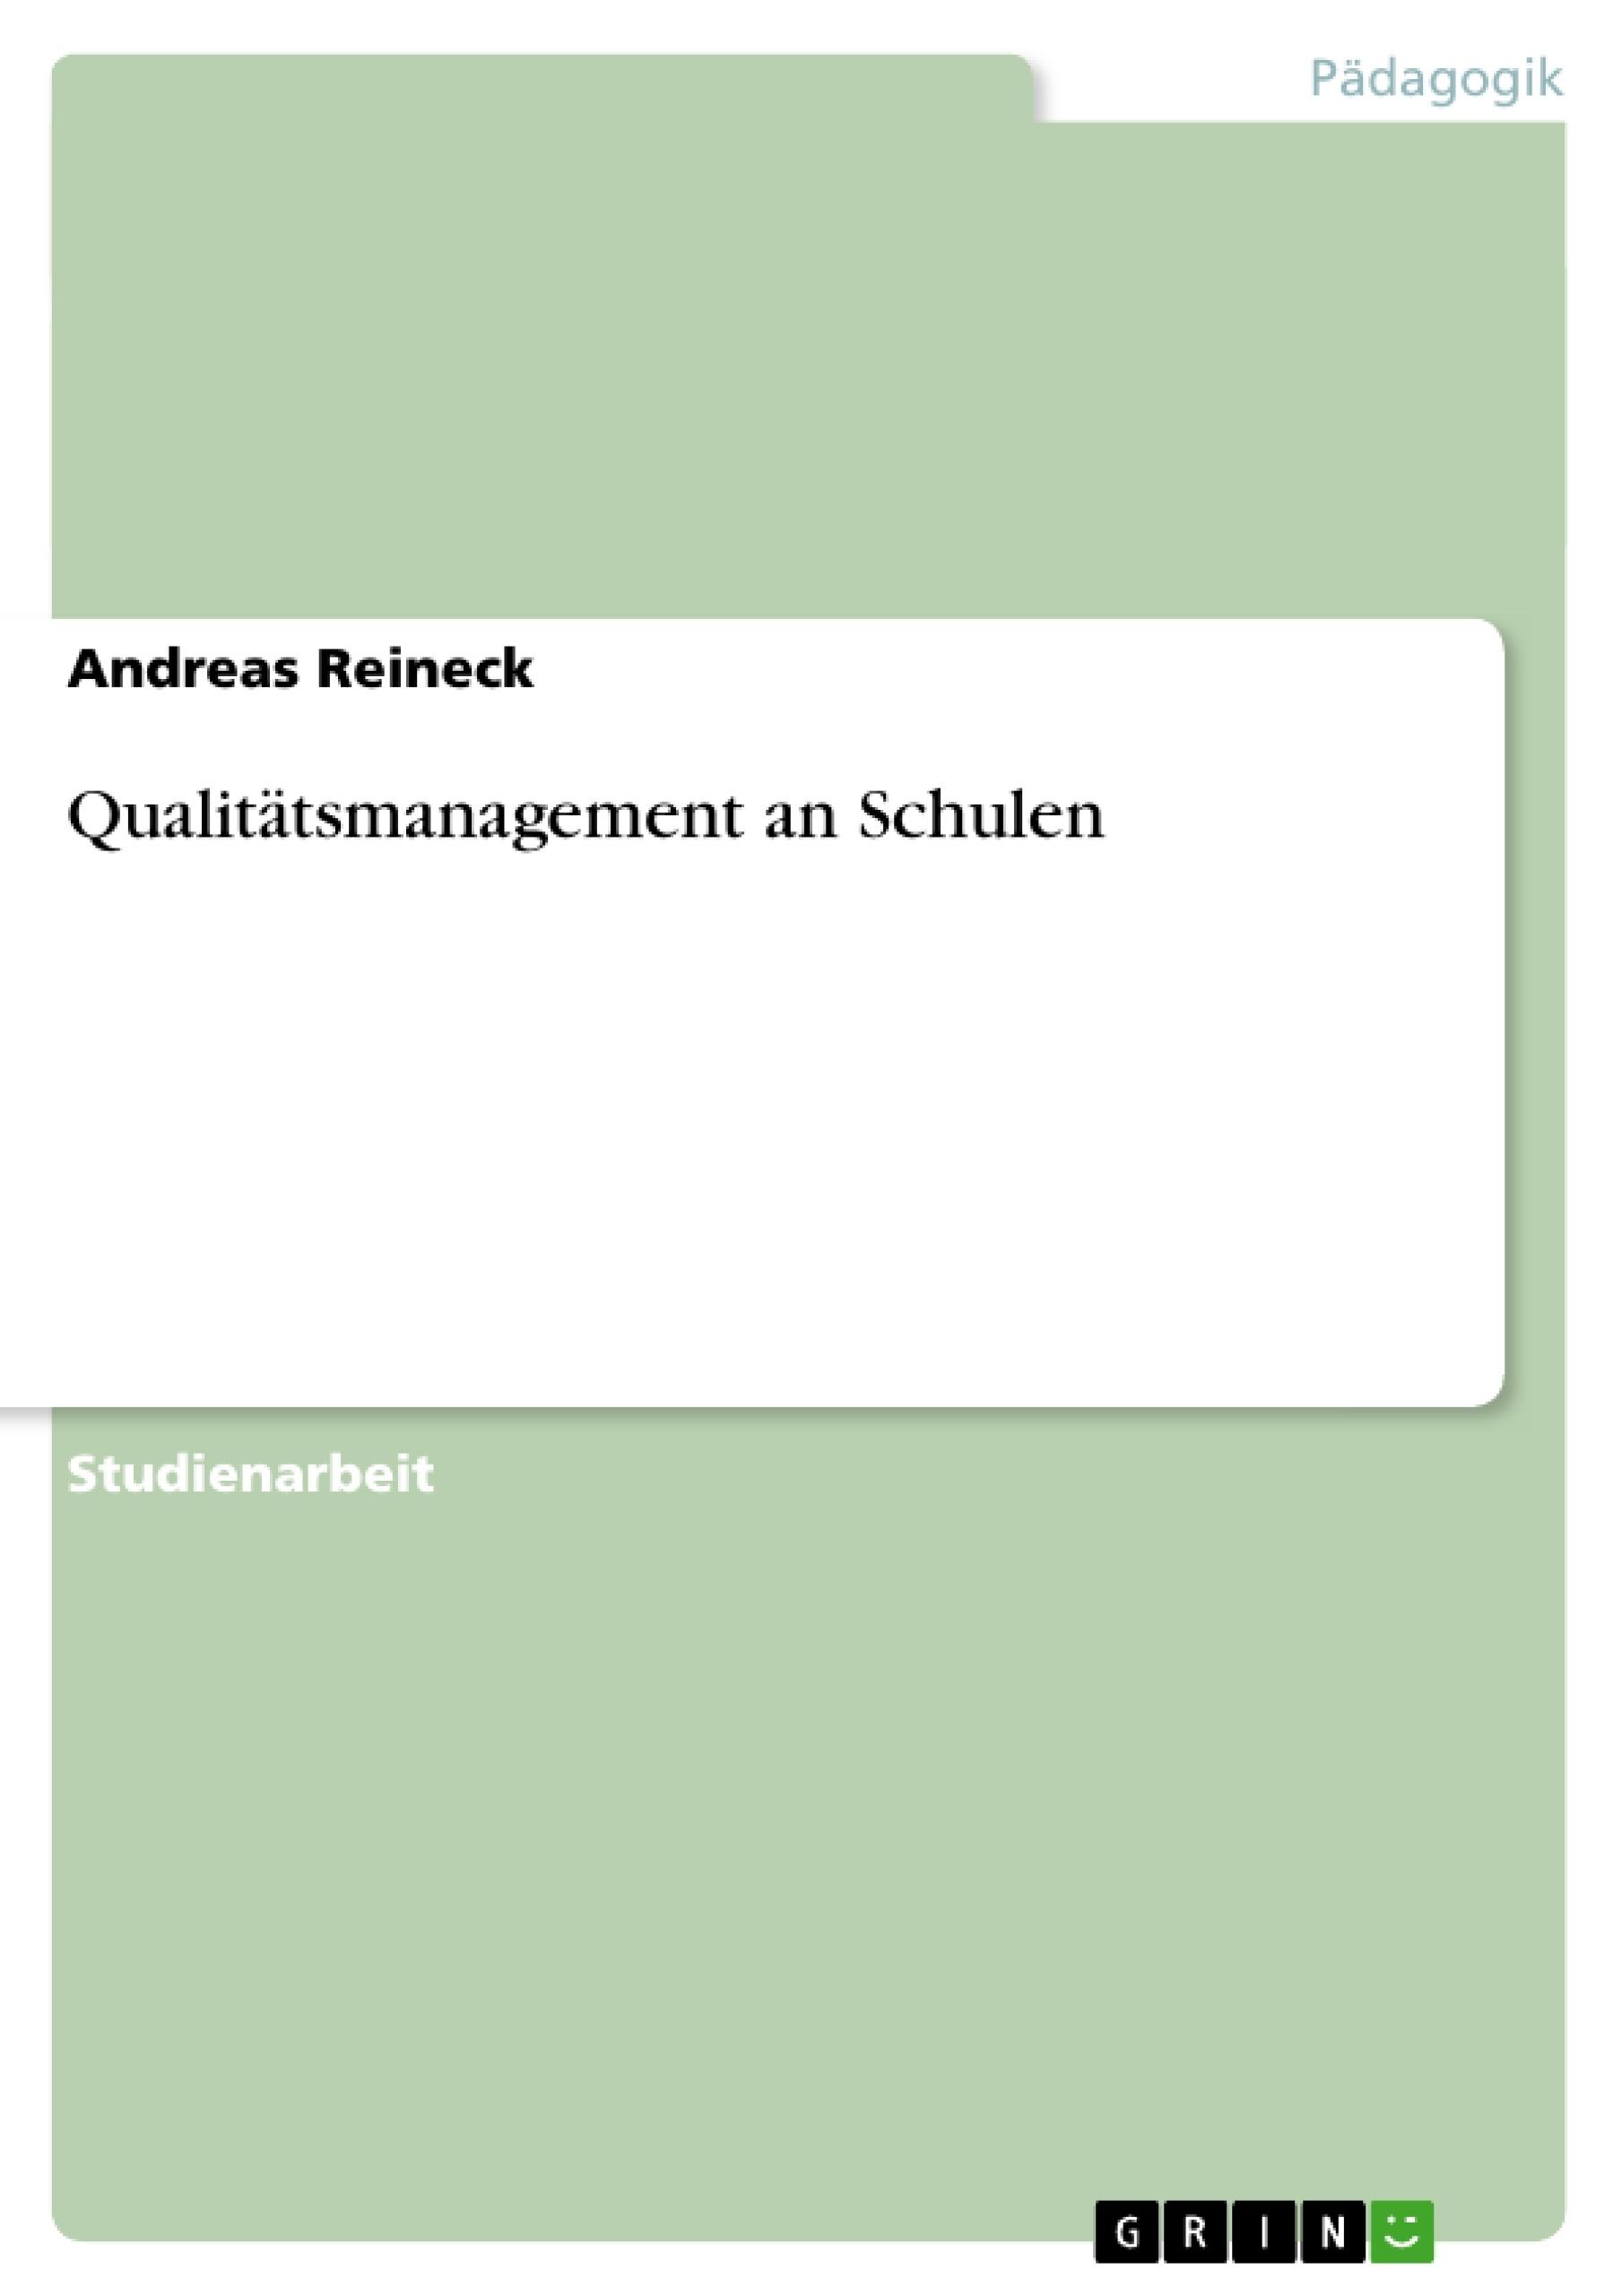 Titel: Qualitätsmanagement an Schulen